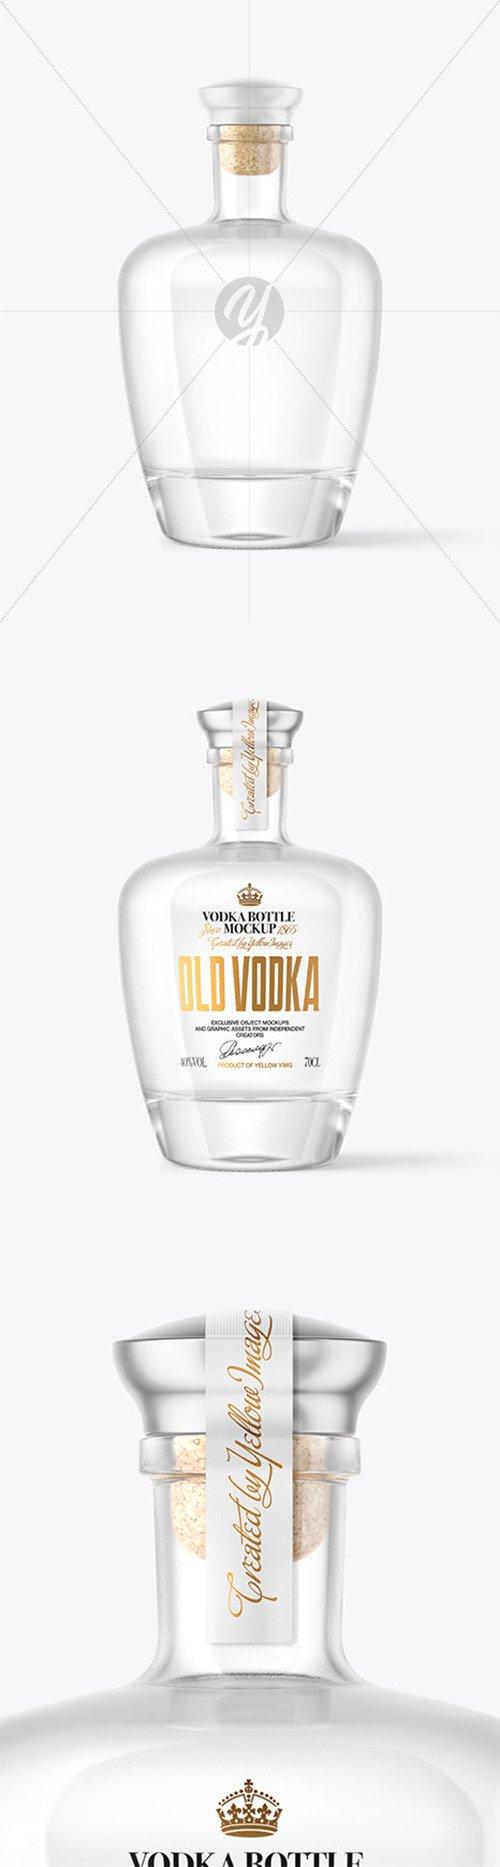 Clear Glass Vodka Bottle Mockup 63867